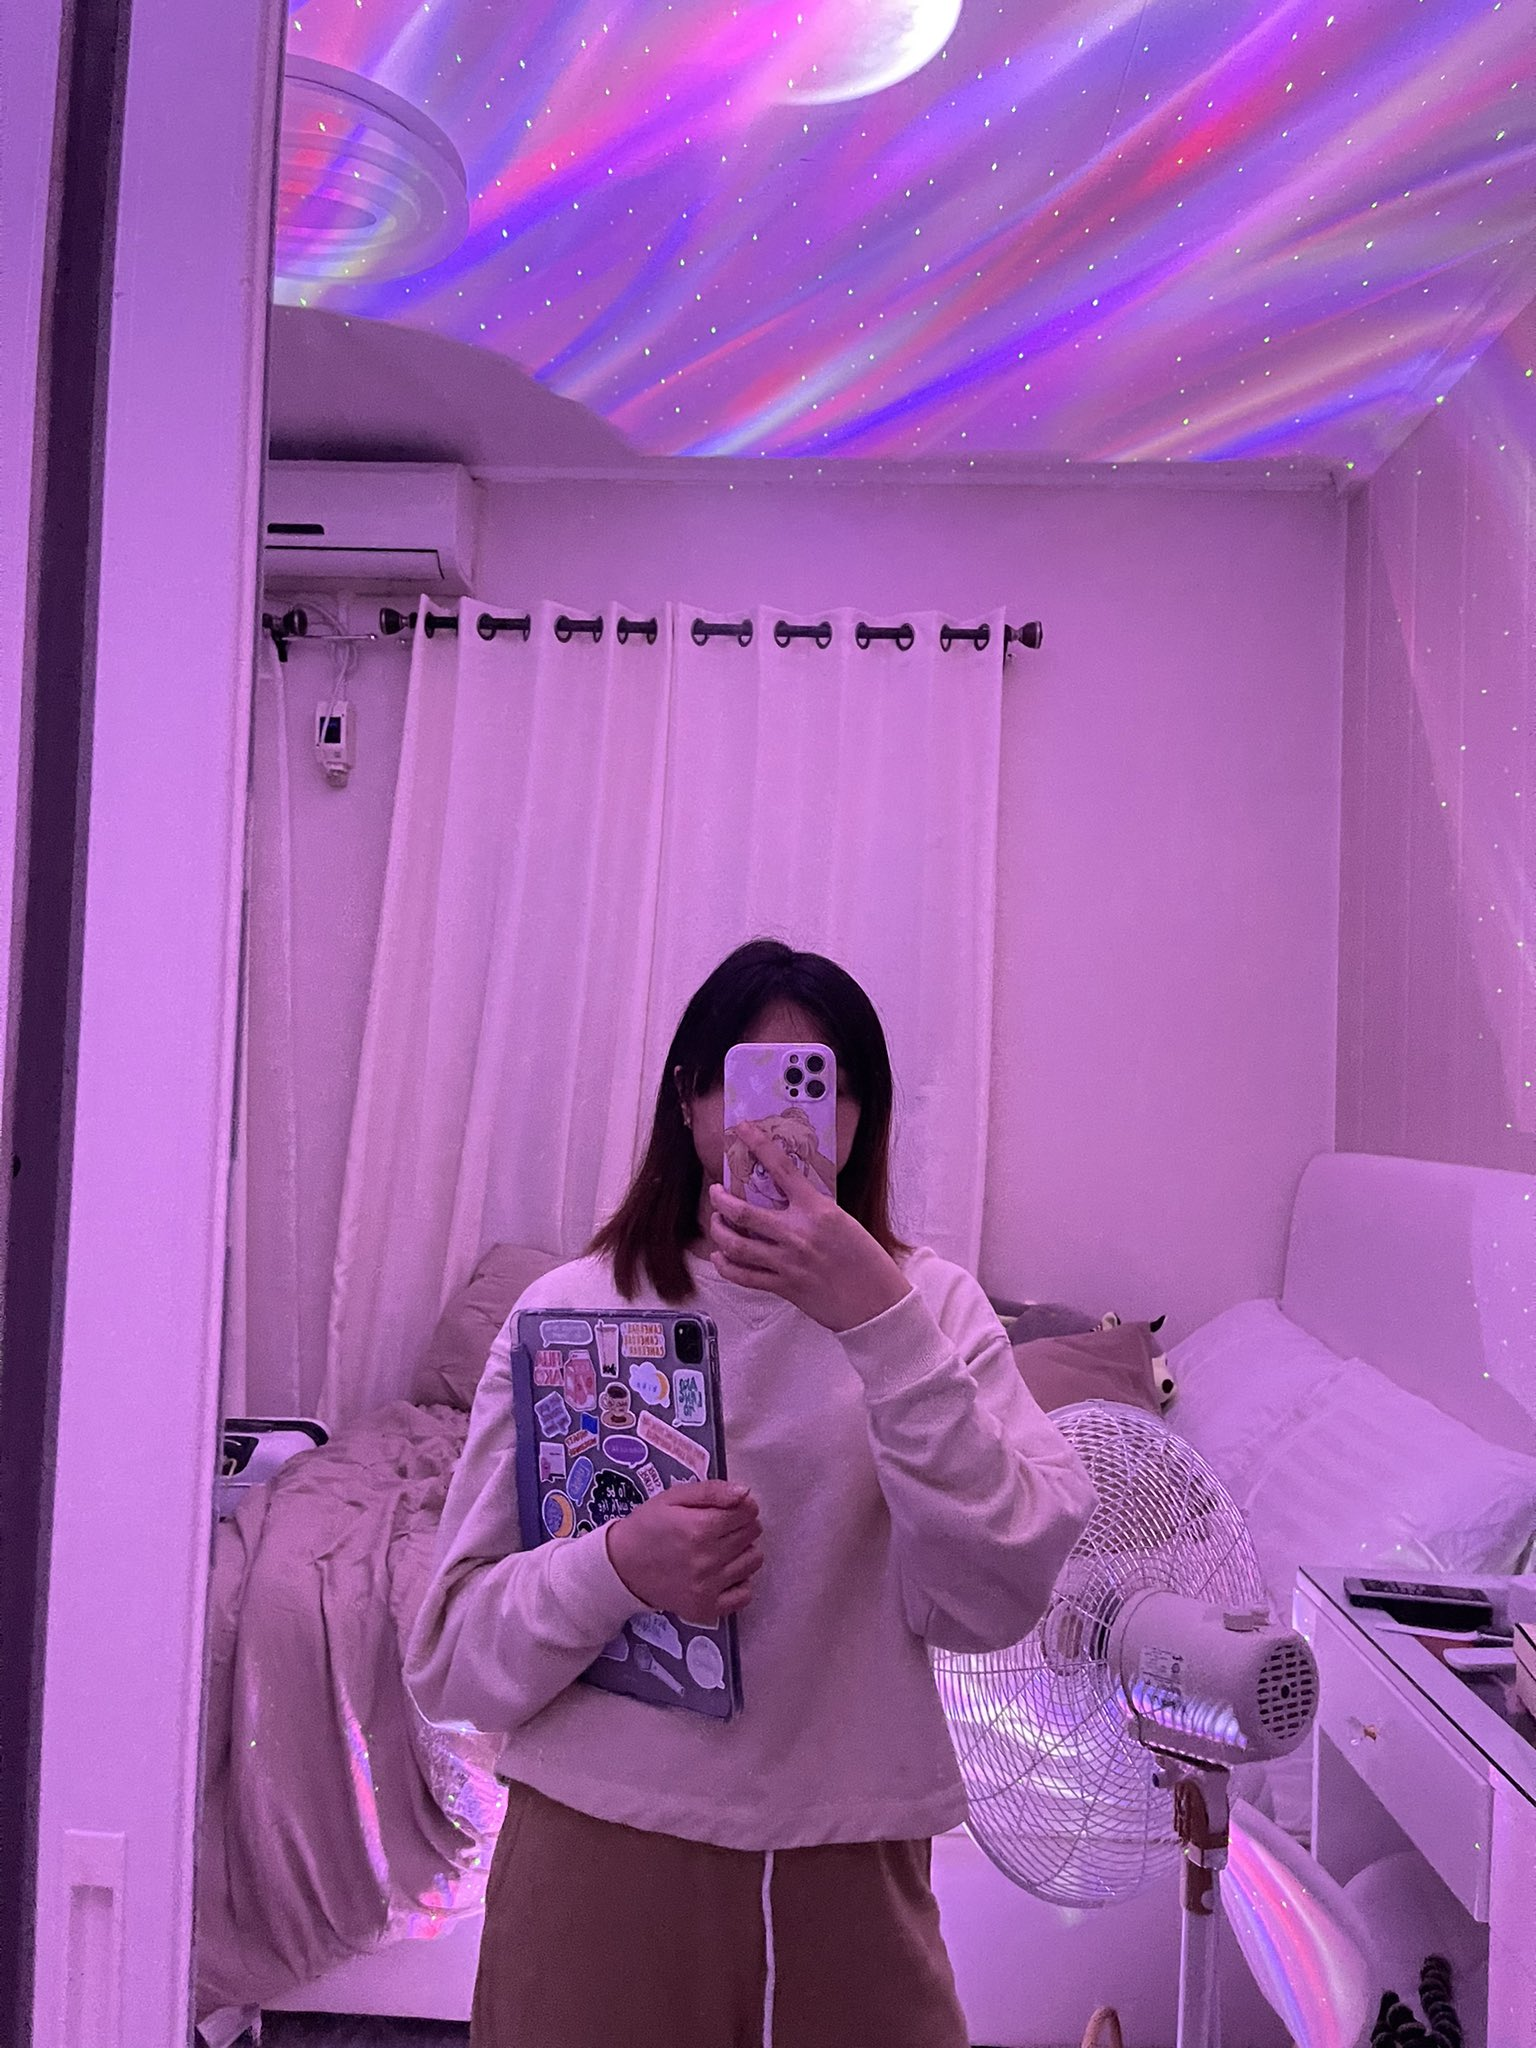 night light galaxy projector in pinay's bedroom